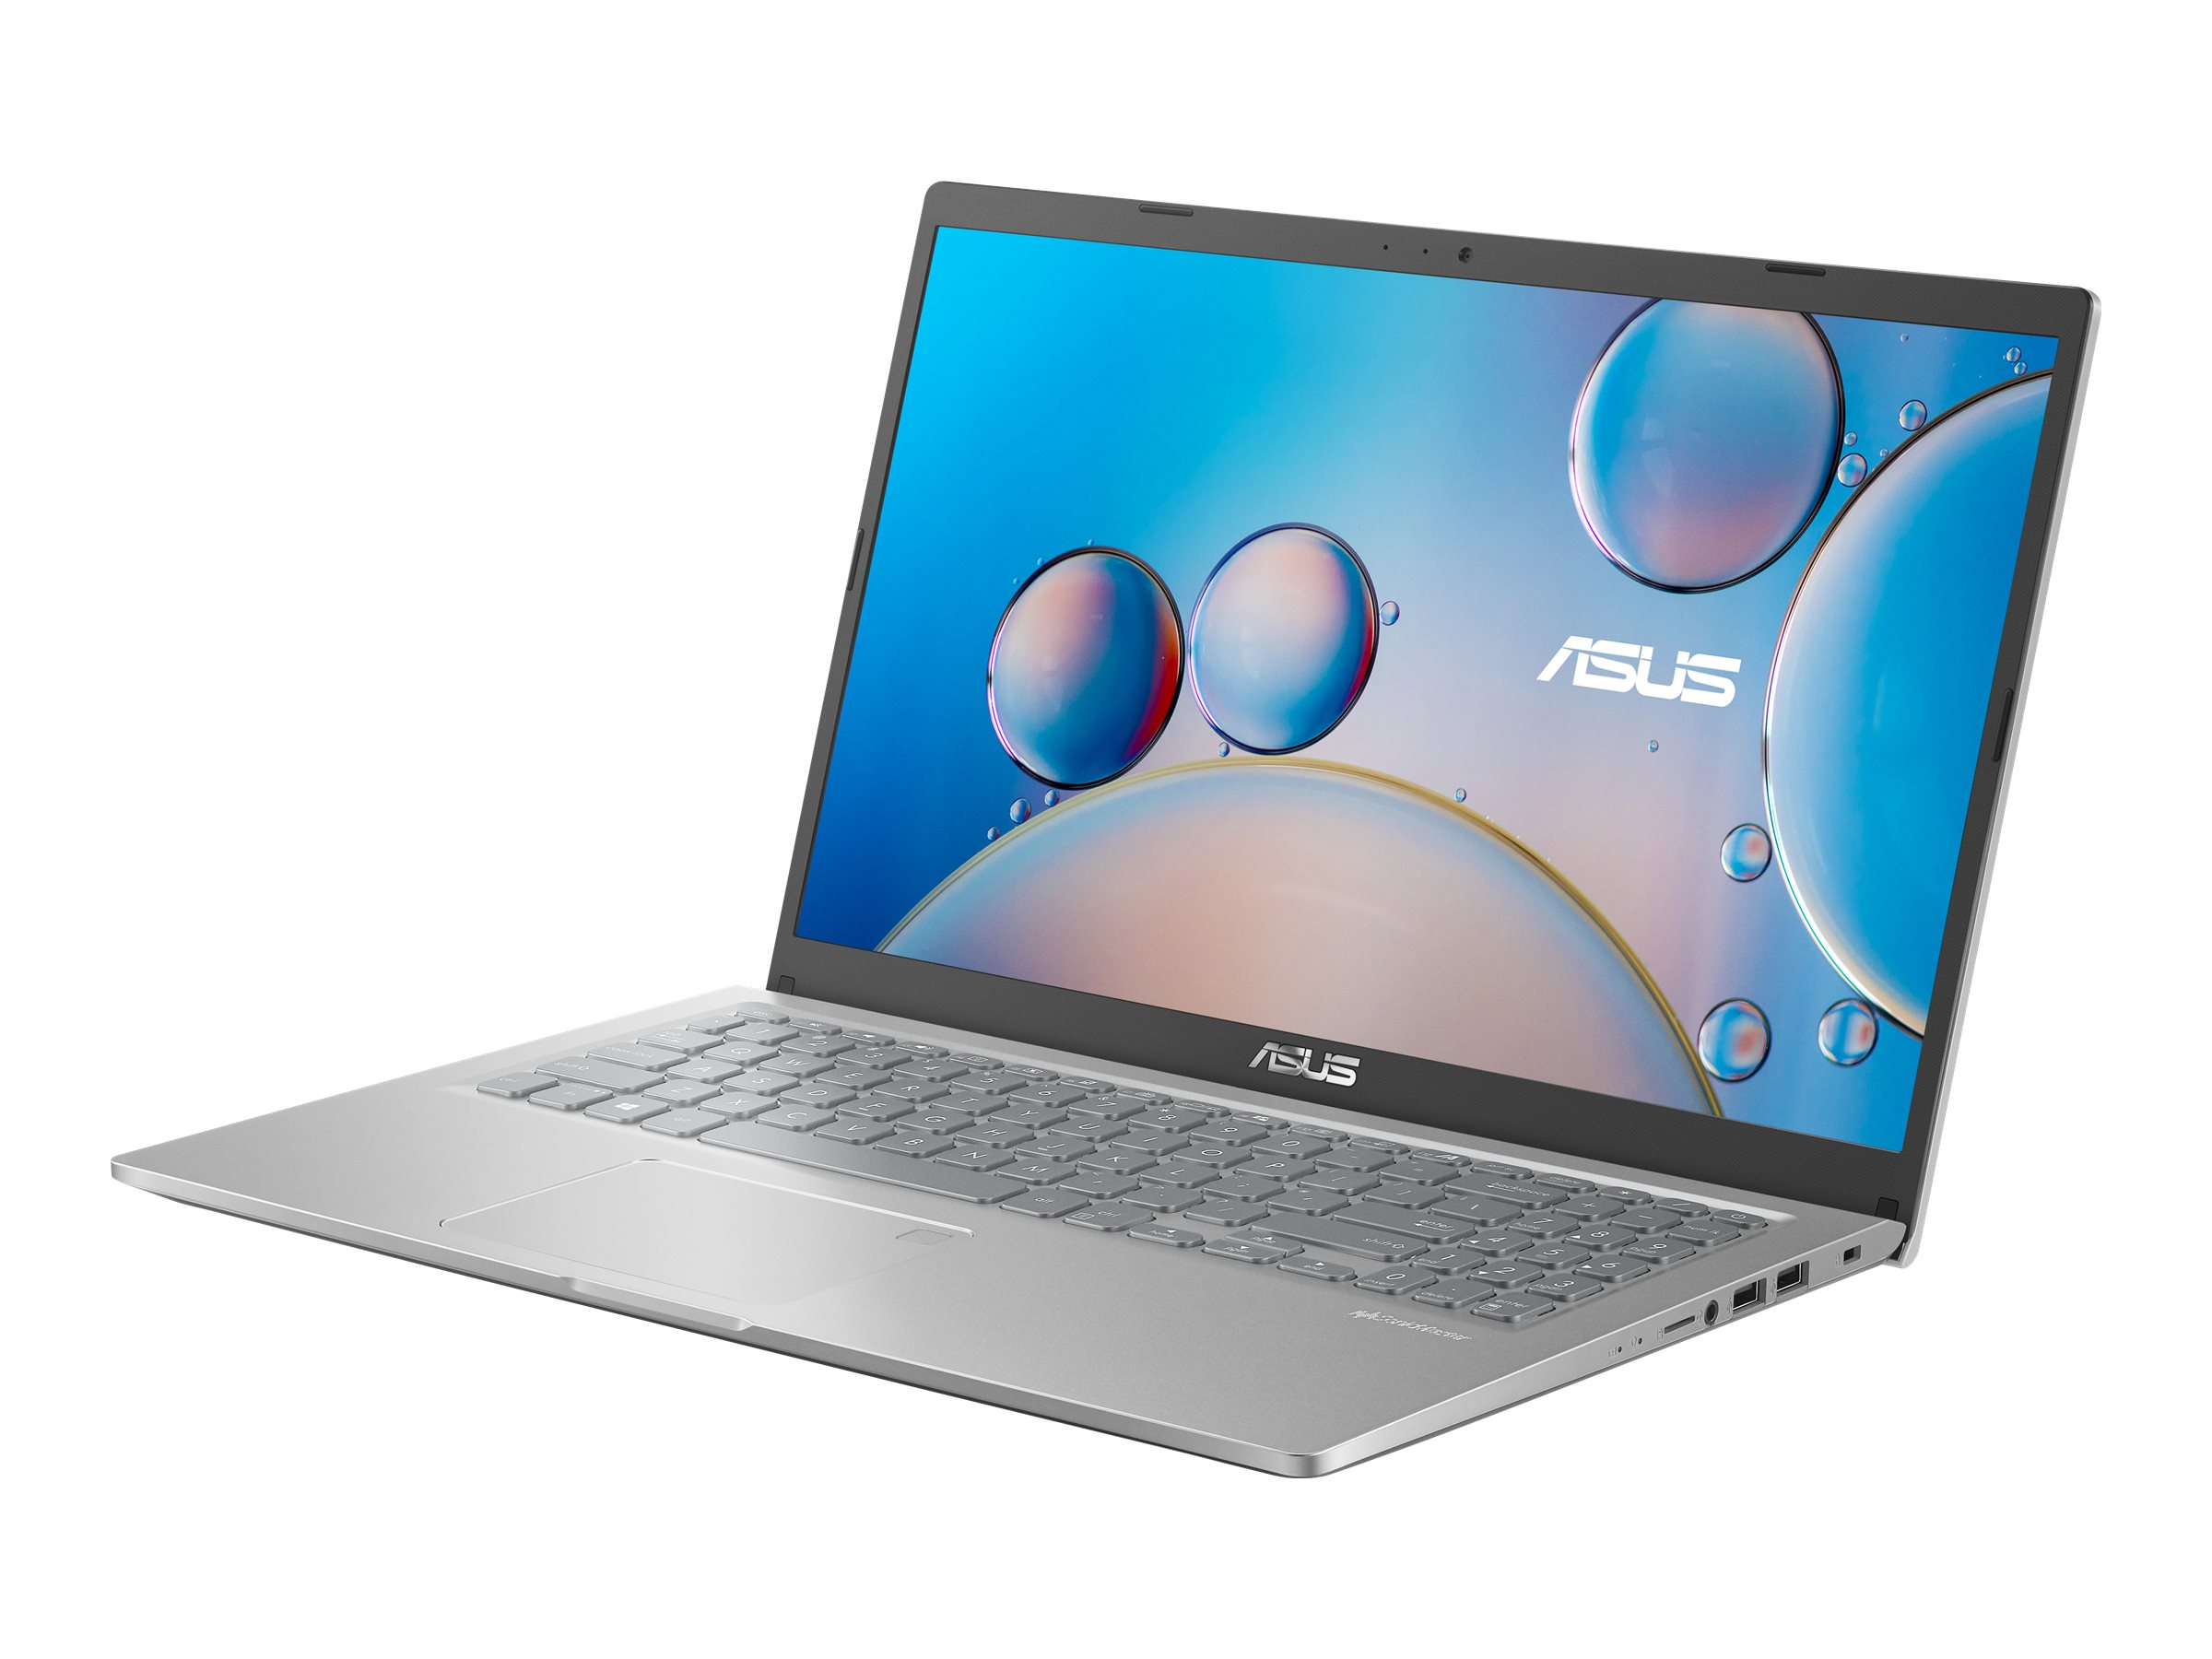 "ASUS 15 X515JA-BQ647T - Core i5 1035G1 / 1 GHz - Windows 10 Home - 8 GB RAM - 512 GB SSD NVMe - 39.6 cm (15.6"")"